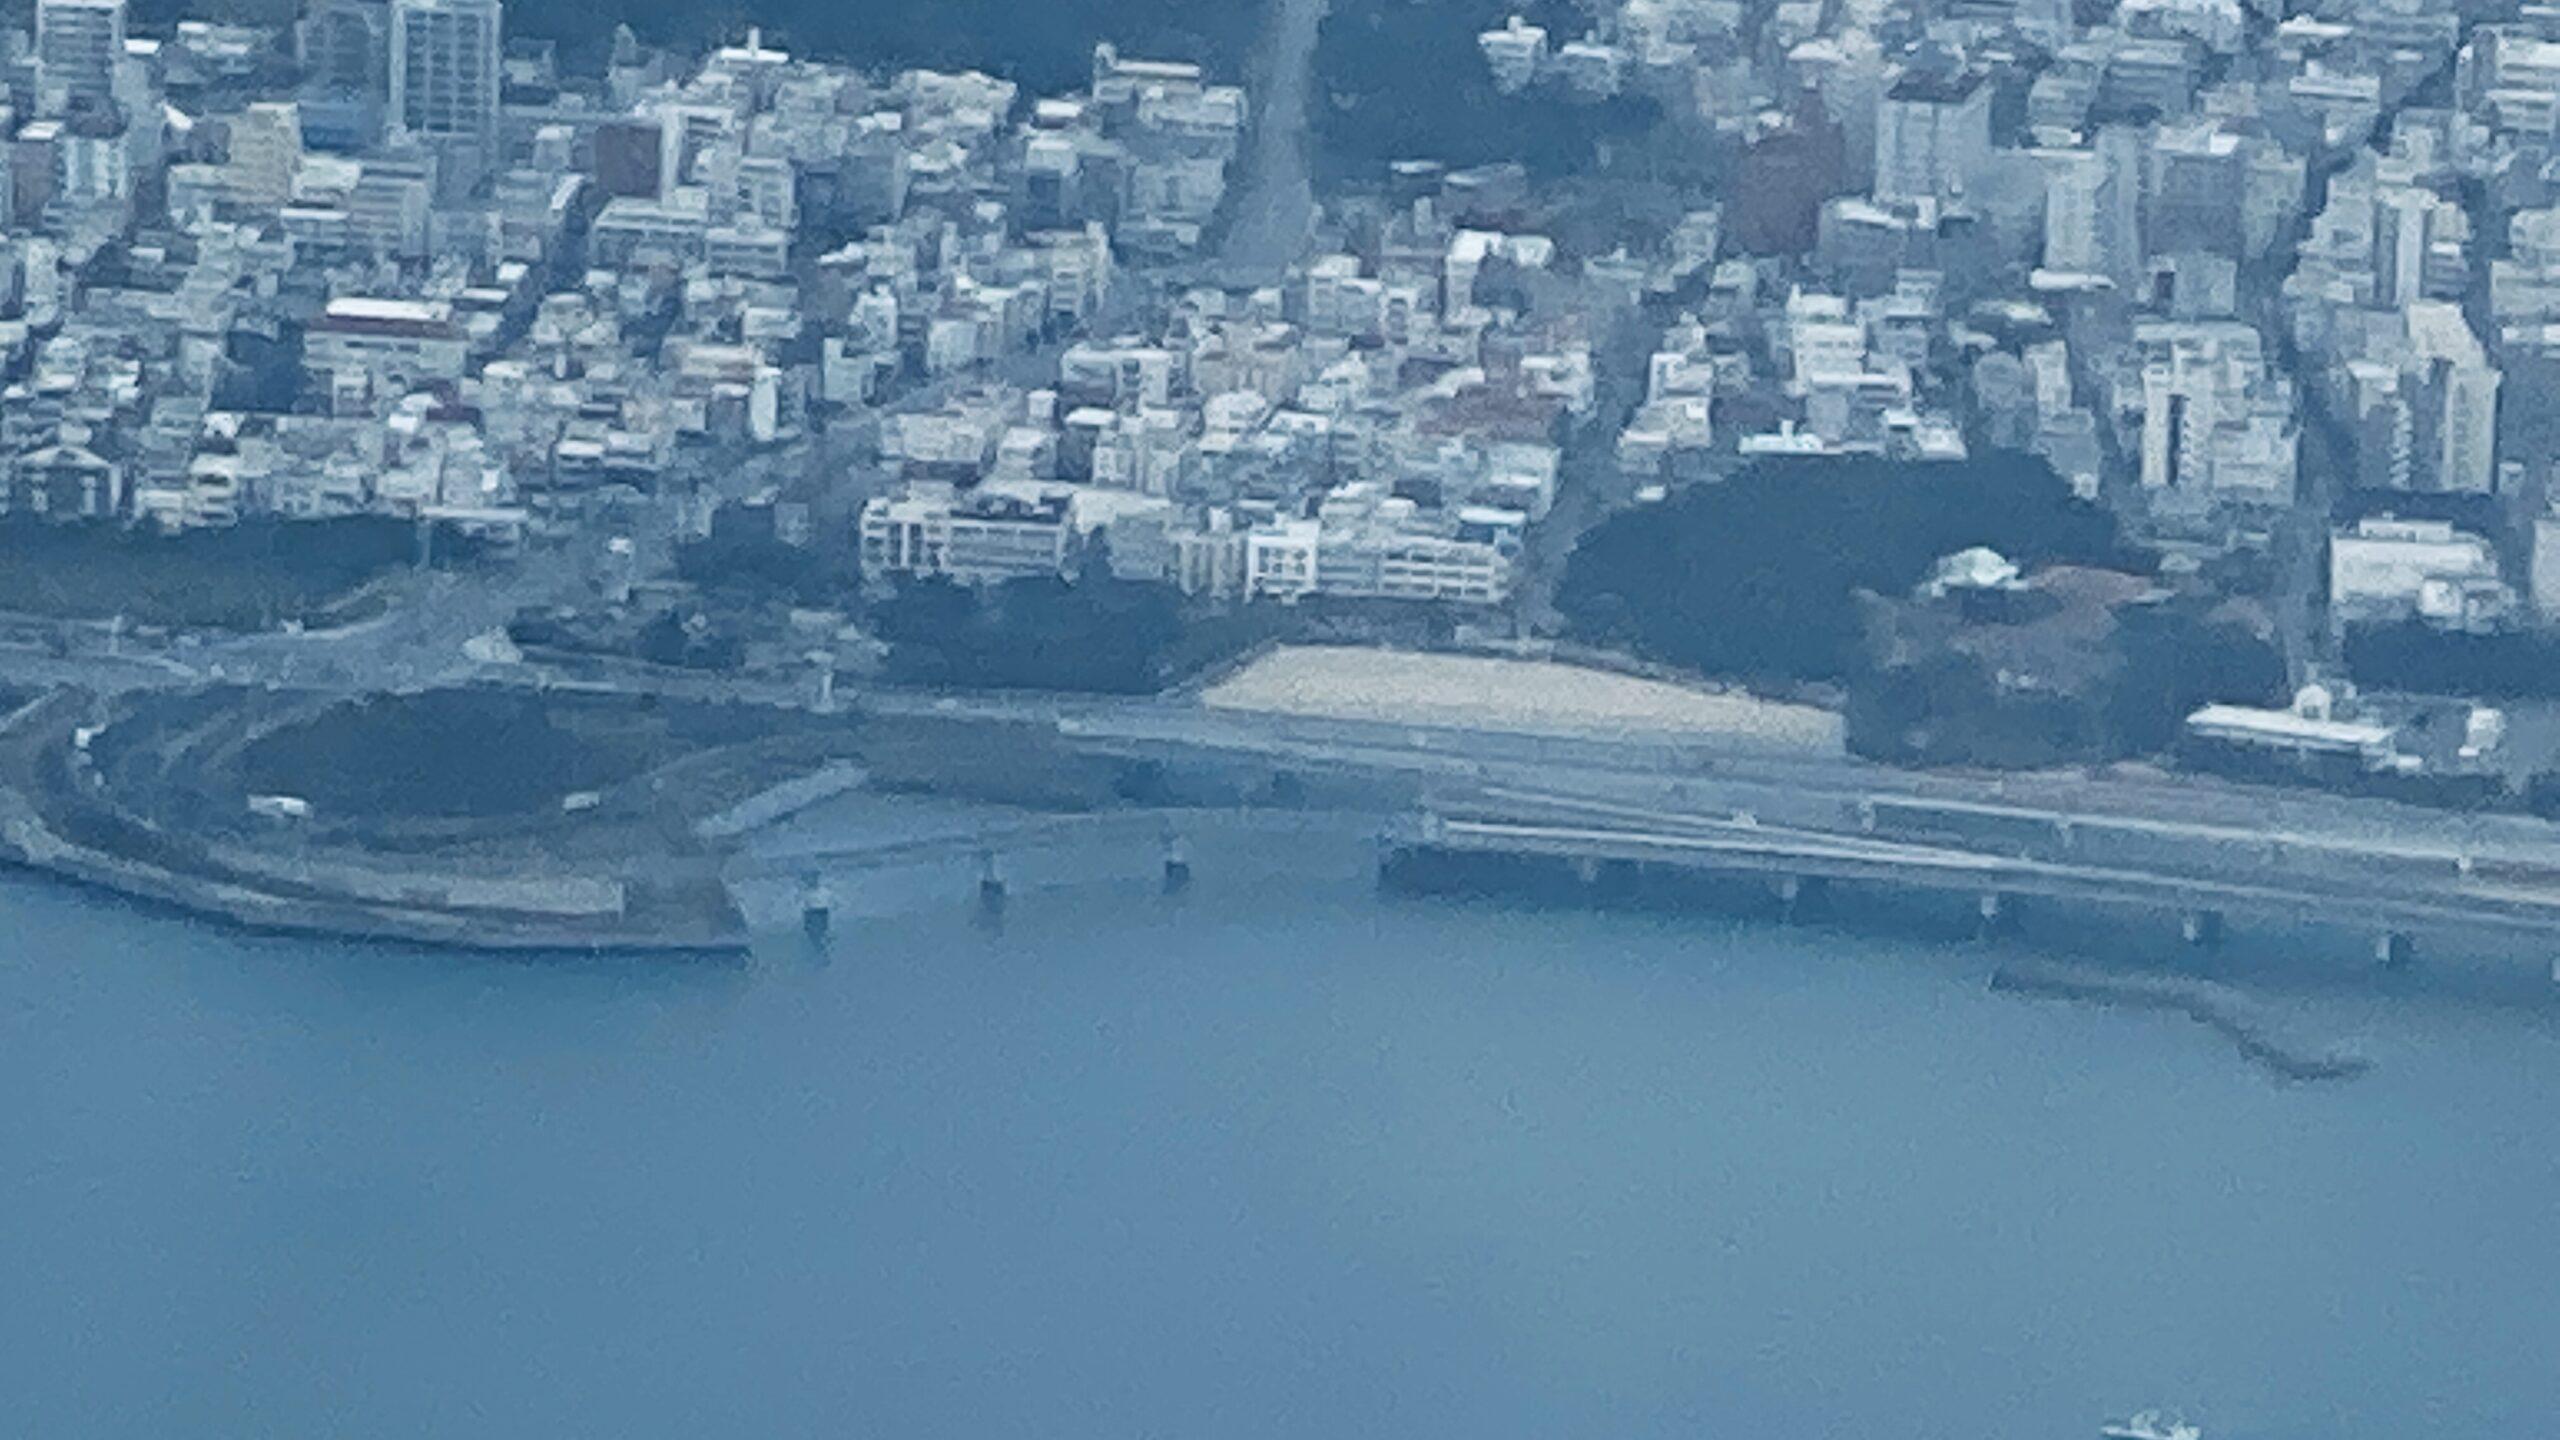 エアバスA350-900型機 JL904 沖縄(那覇)~羽田 普通席 搭乗記 18JAN21